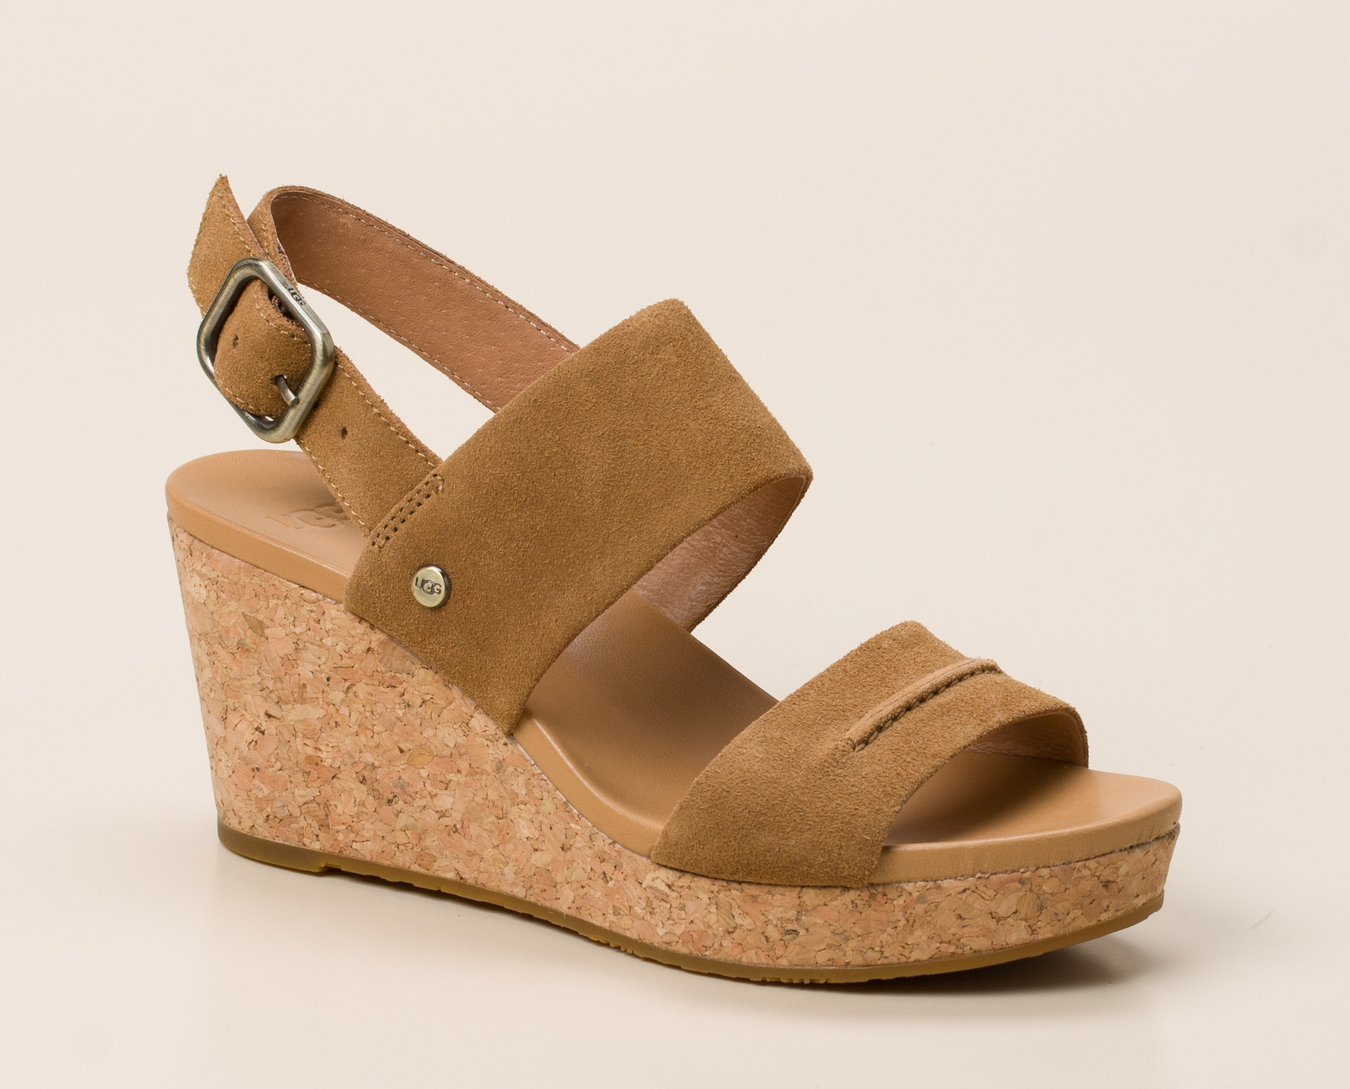 Hochwertige Modelle Der UGG Damen Sandalen & Sandaletten